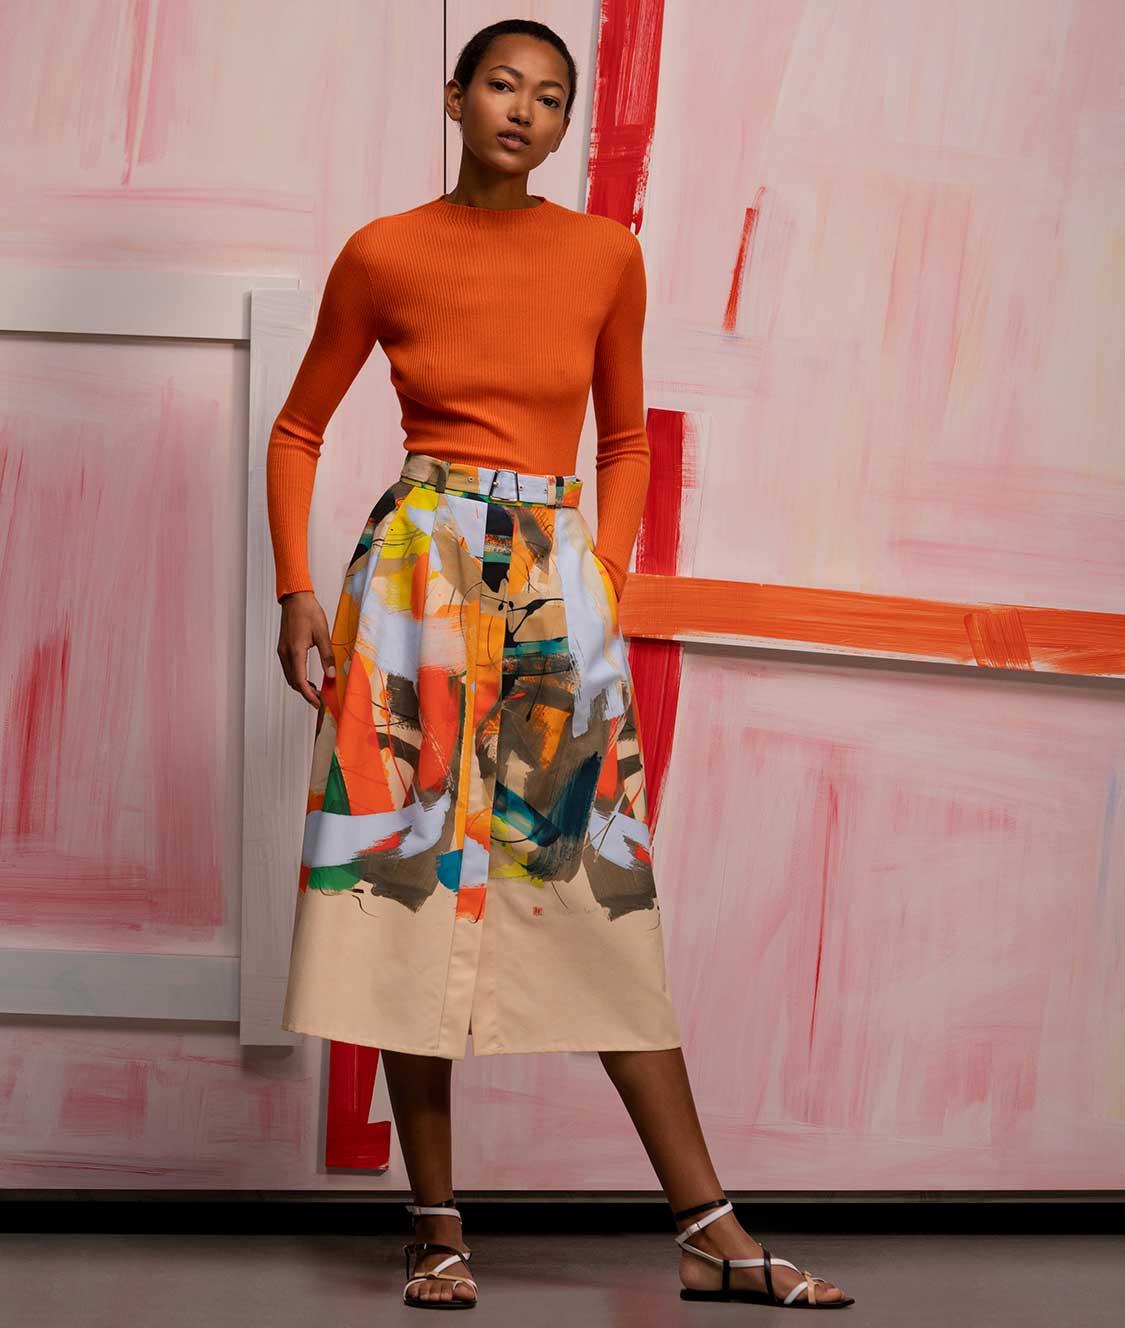 Orange Luxury top and printed Skirt under the knee